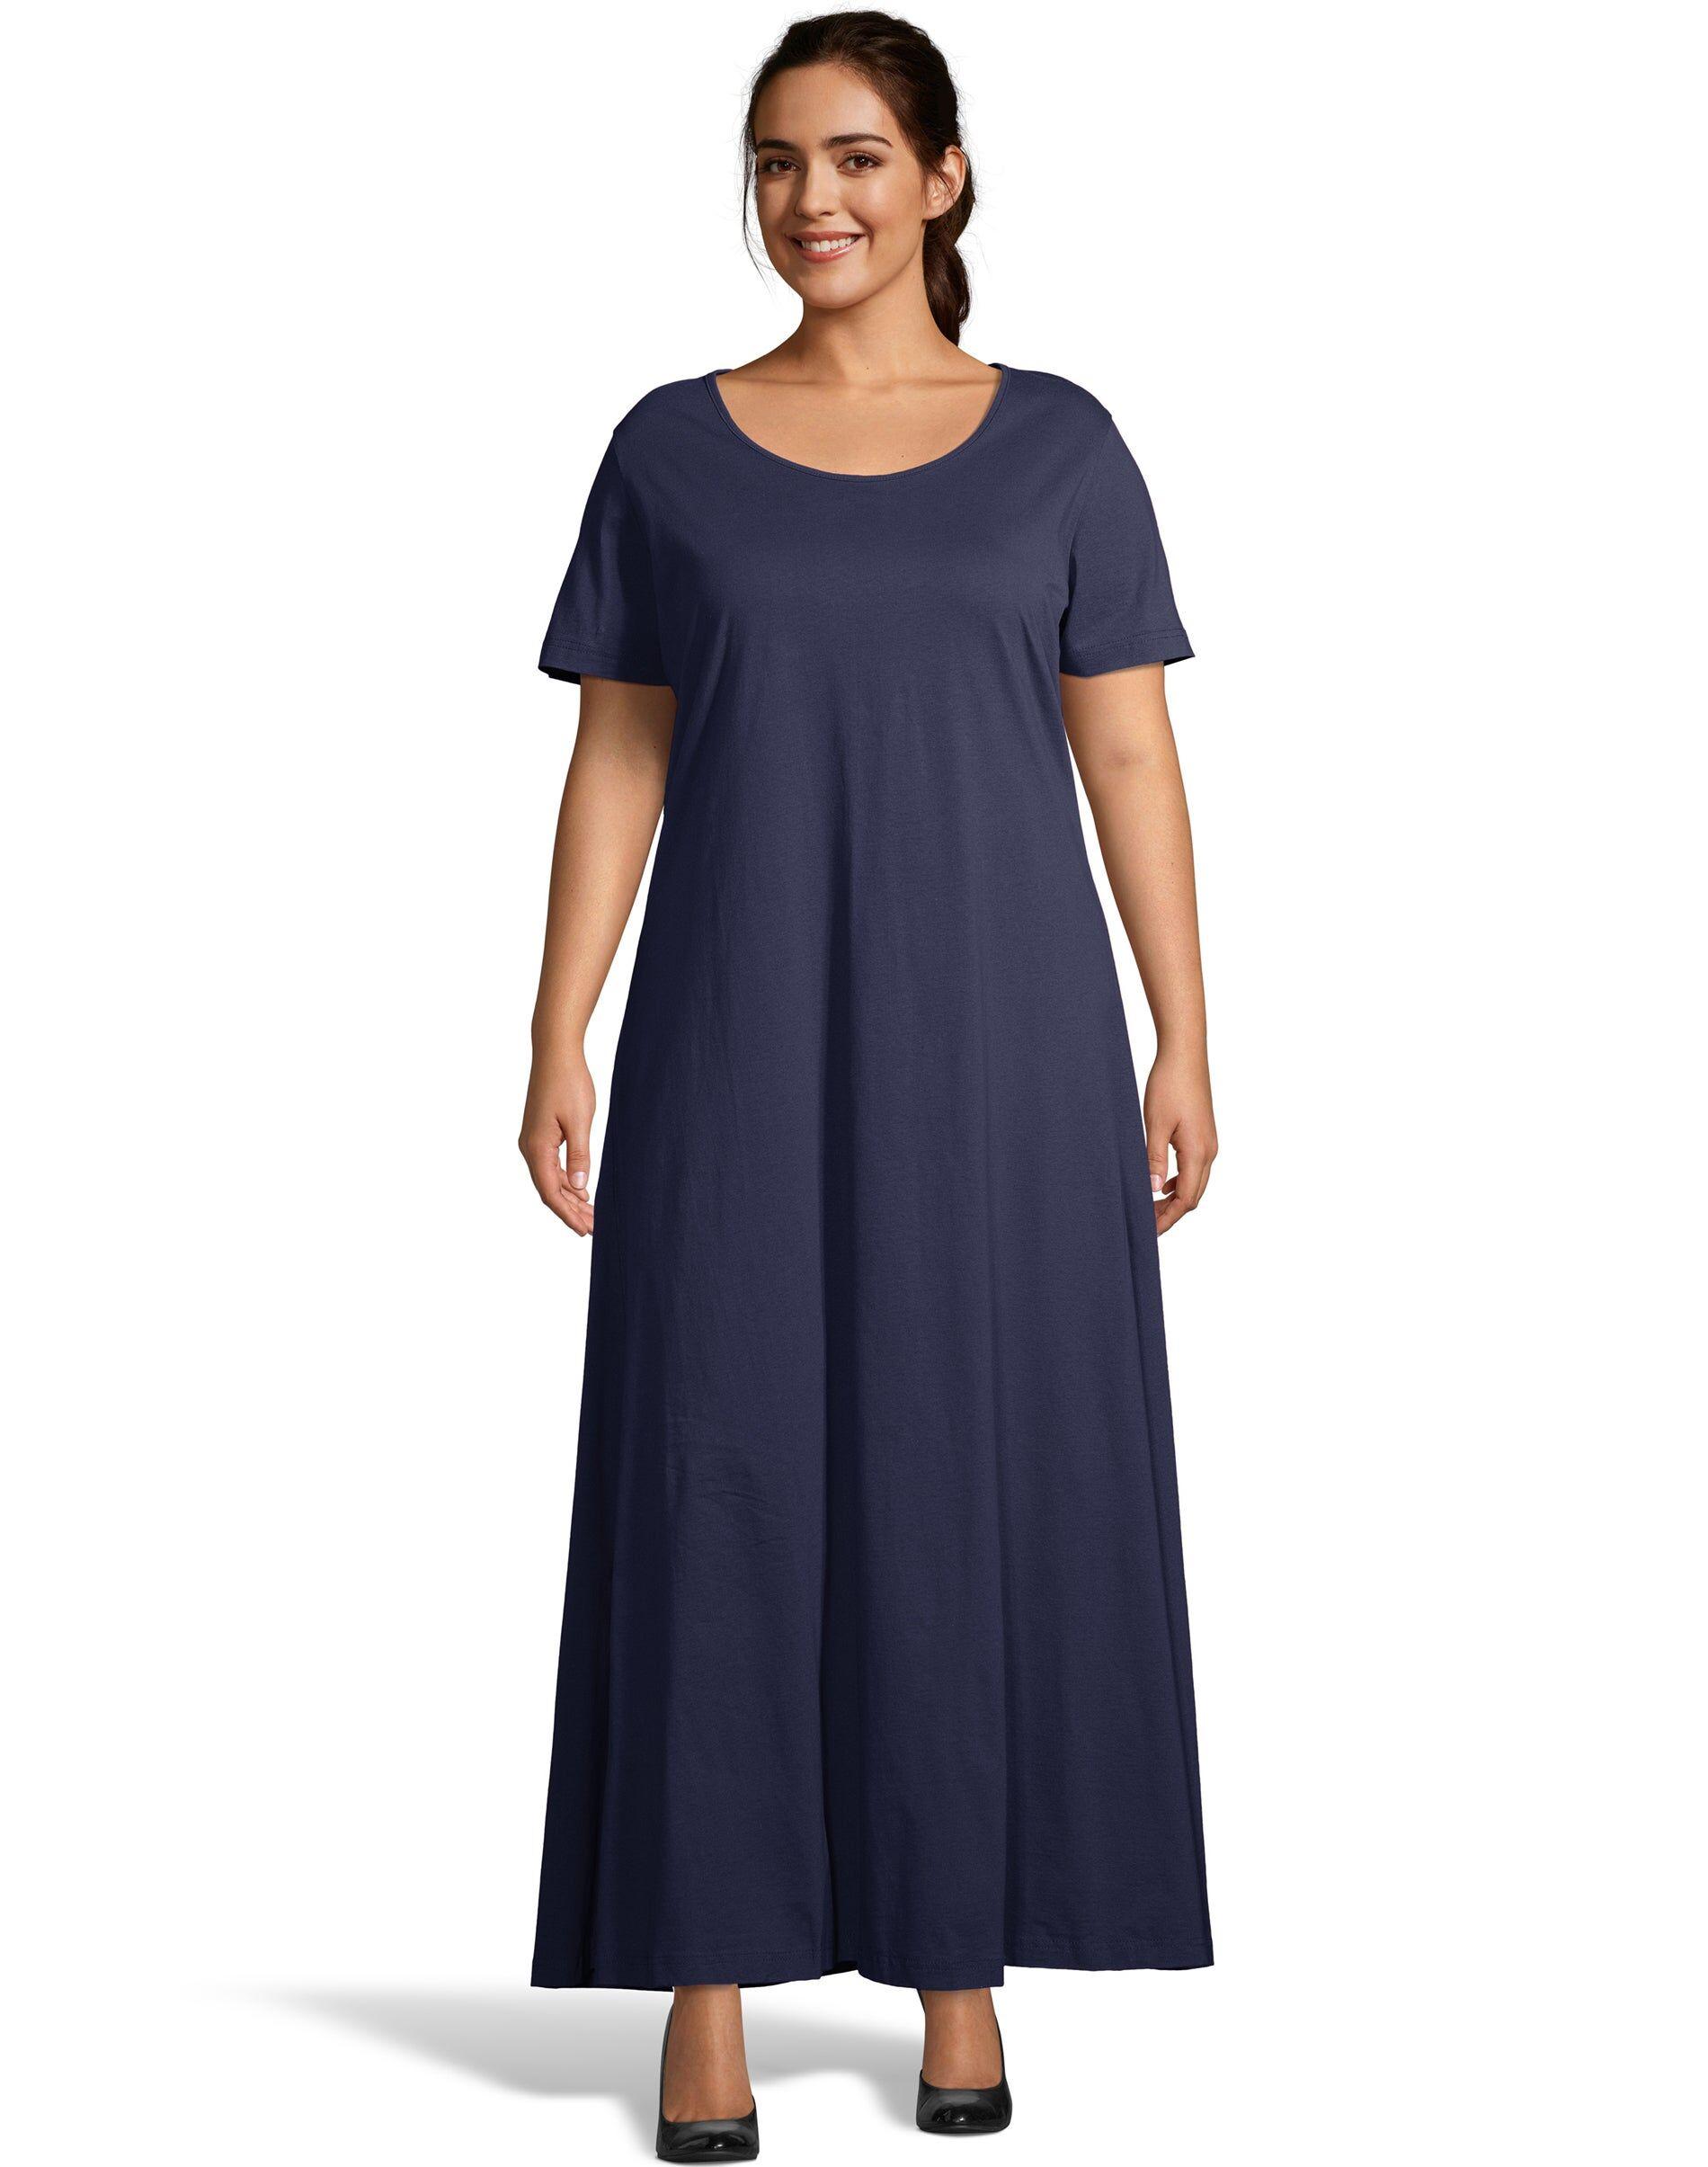 Just My Size Jersey Matchables Maxi Dress Navy 1X Women's